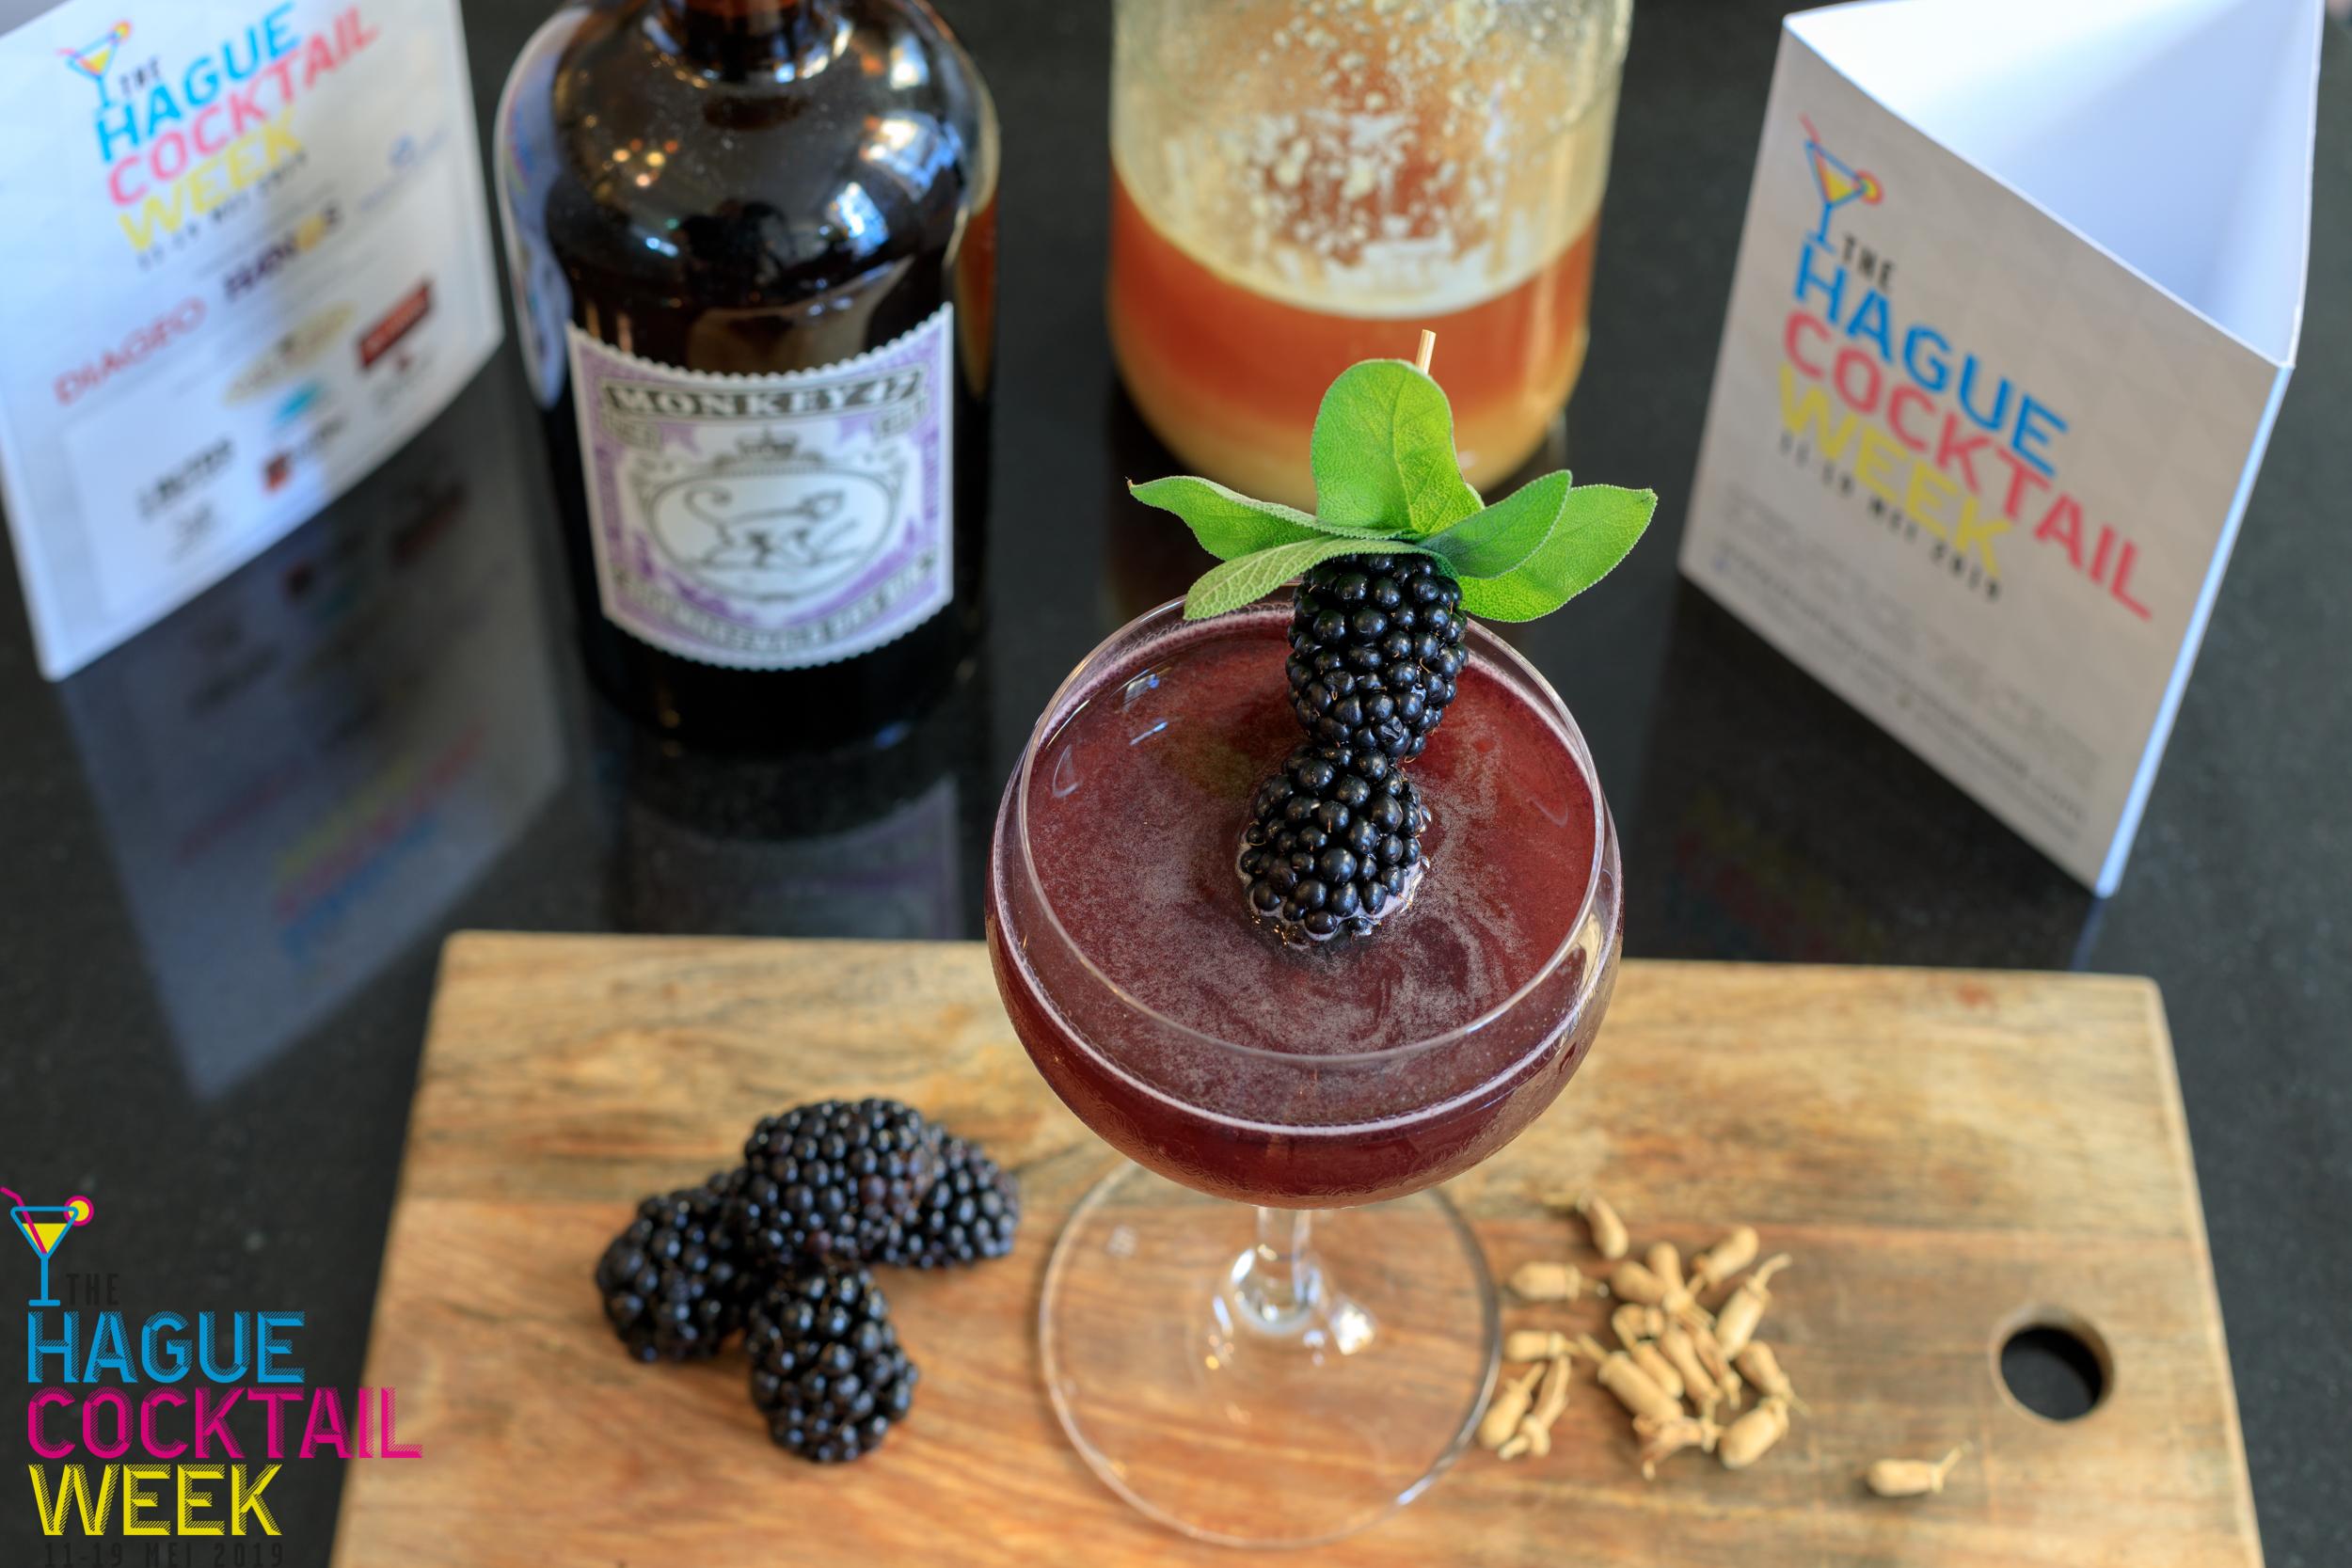 Tapisco | The Hague Cocktailweek-6.jpg